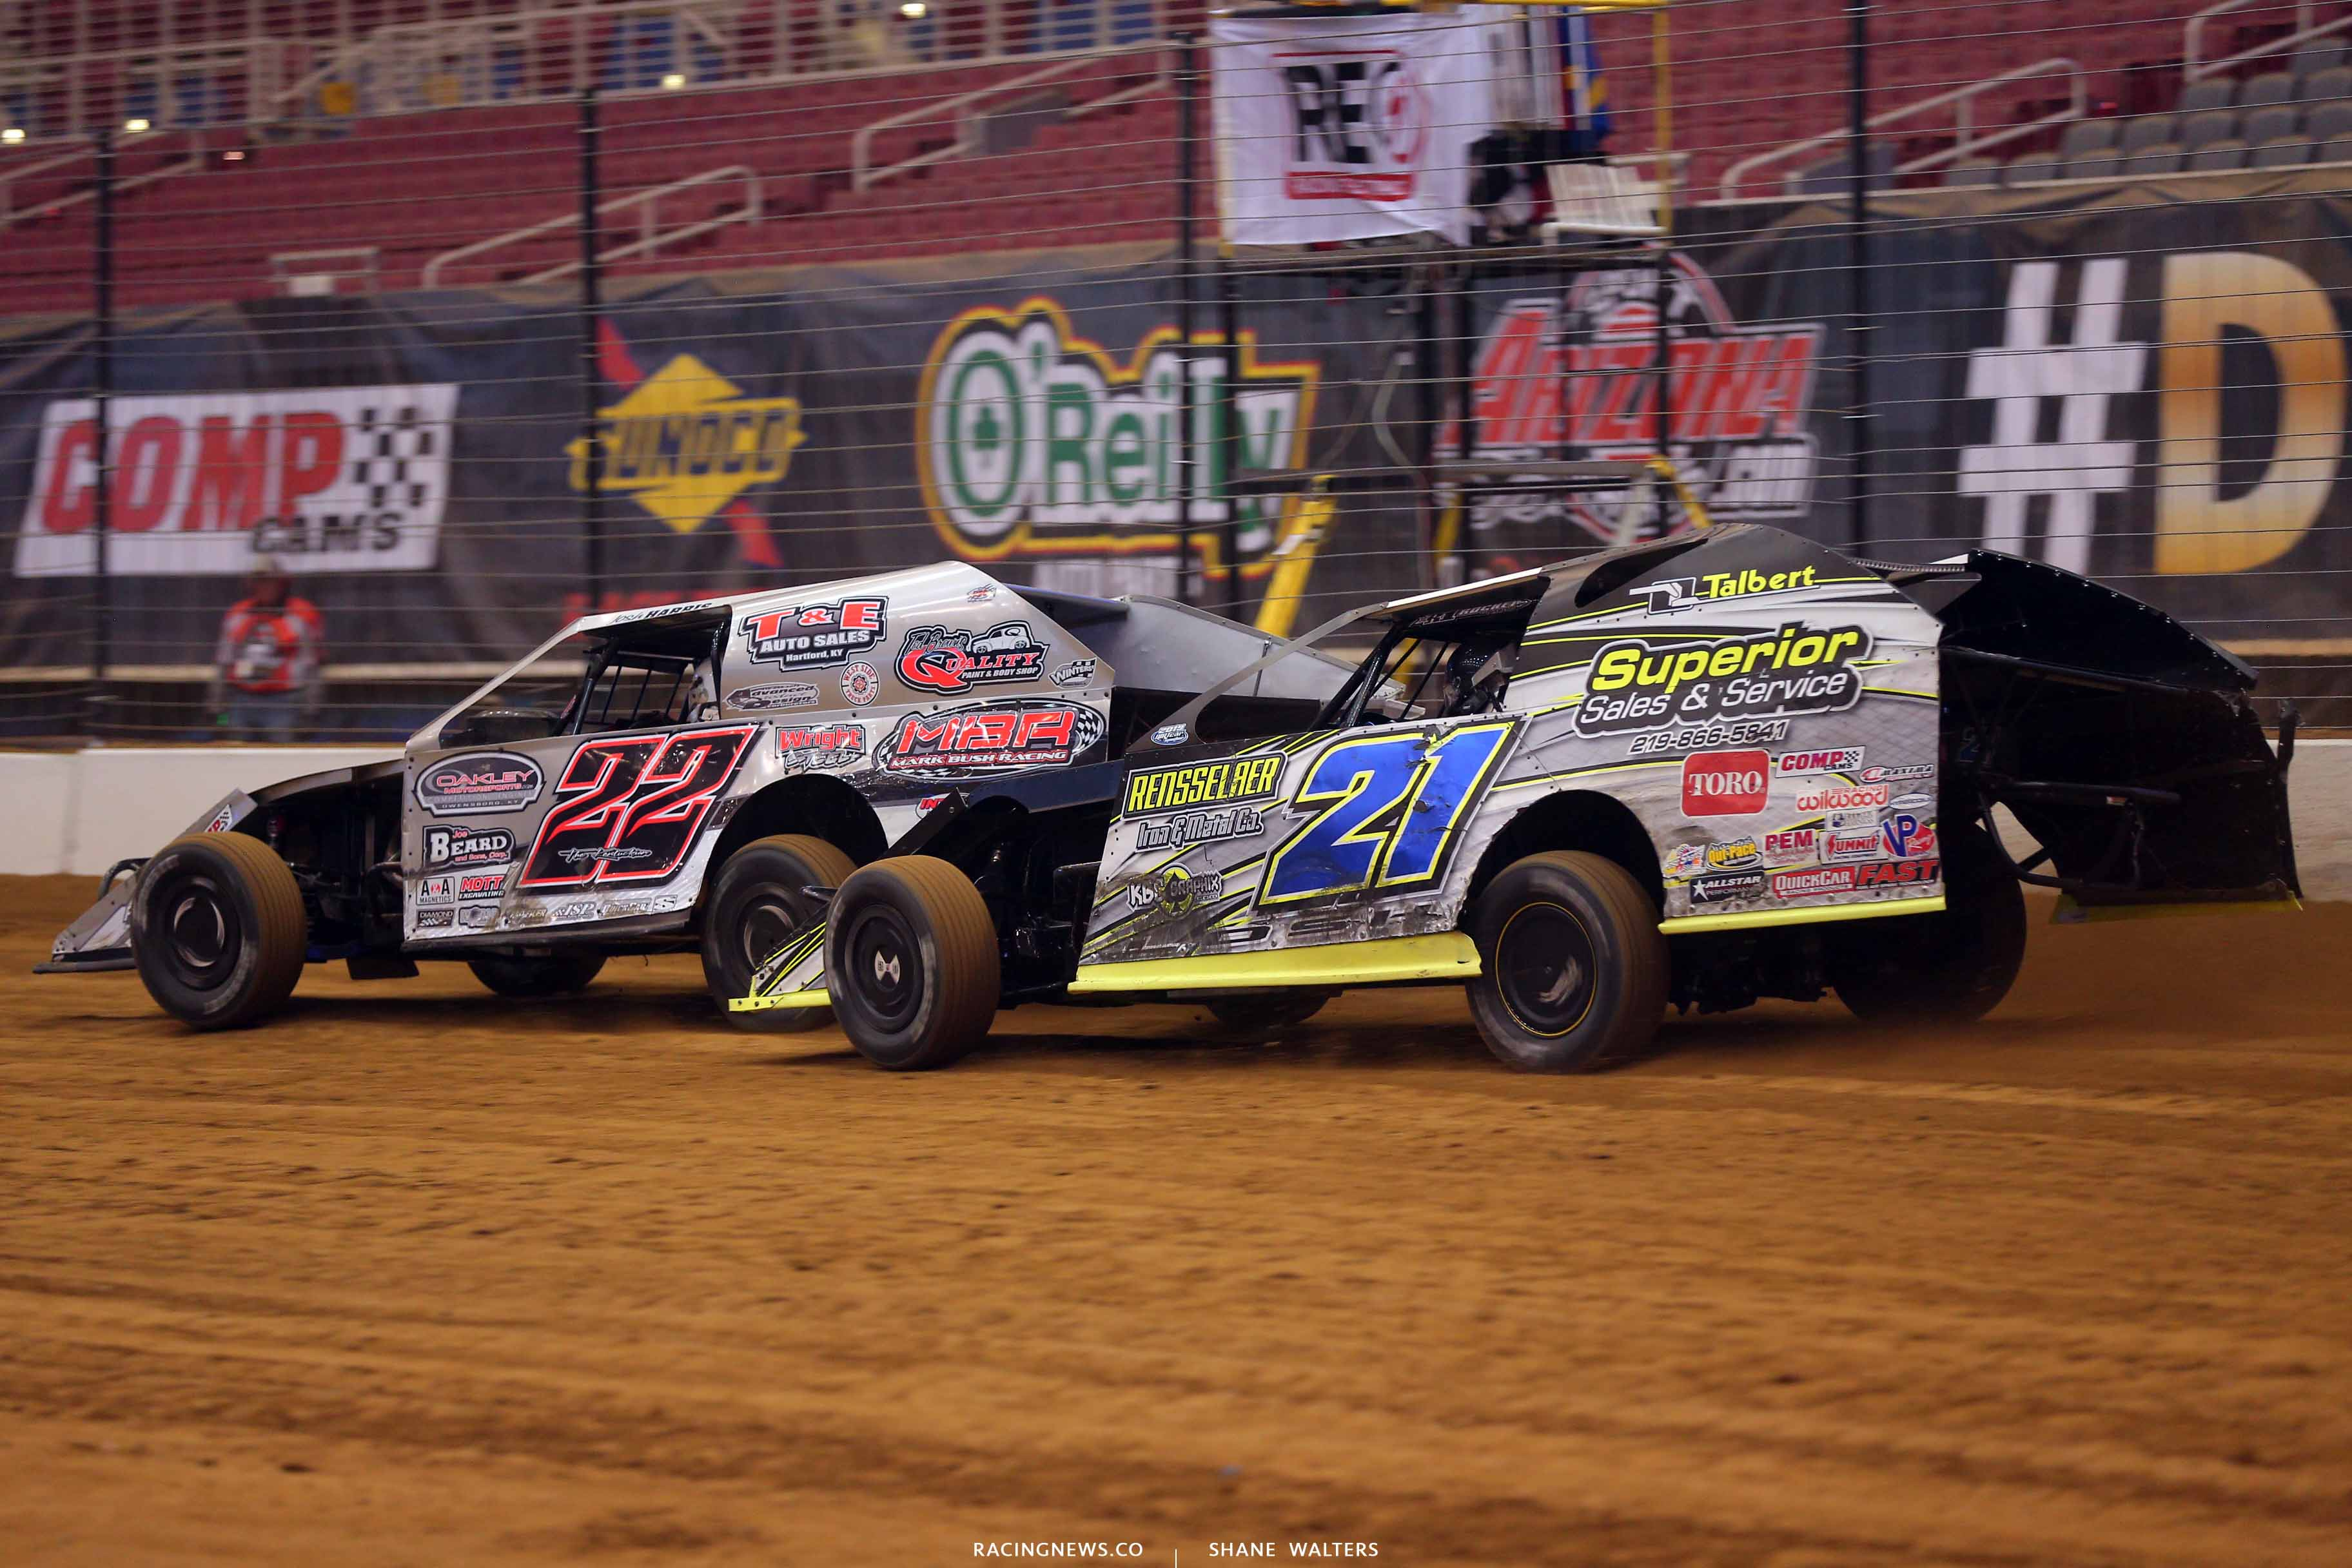 Josh Harris and Derek Losh in the Gateway Dirt Nationals - Dirt Modifieds 2115